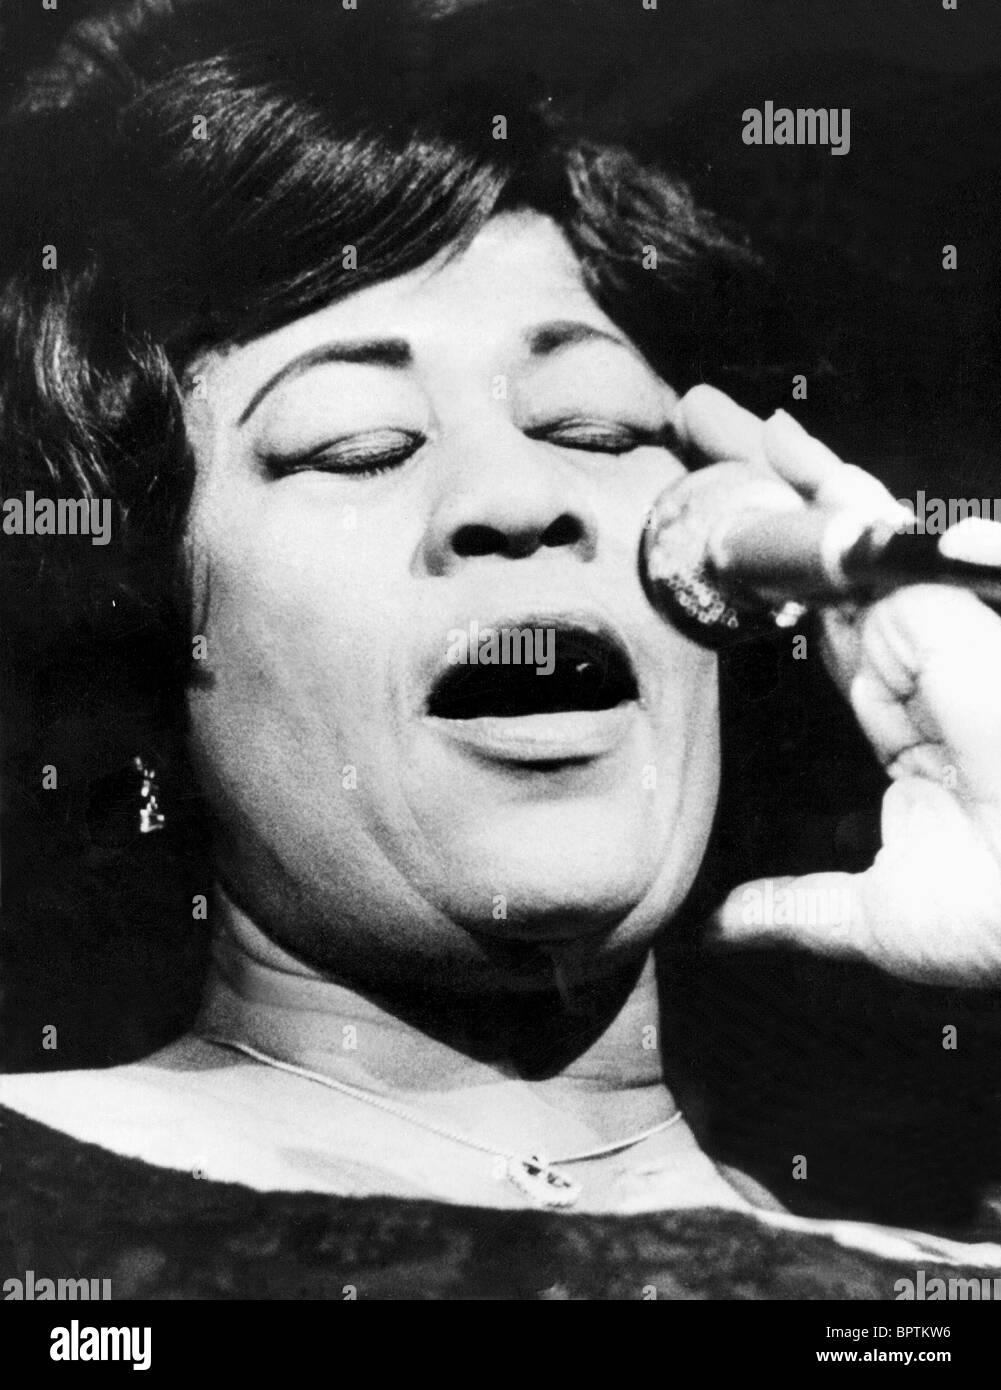 ELLA FITZGERALD SINGER (1958) - Stock Image